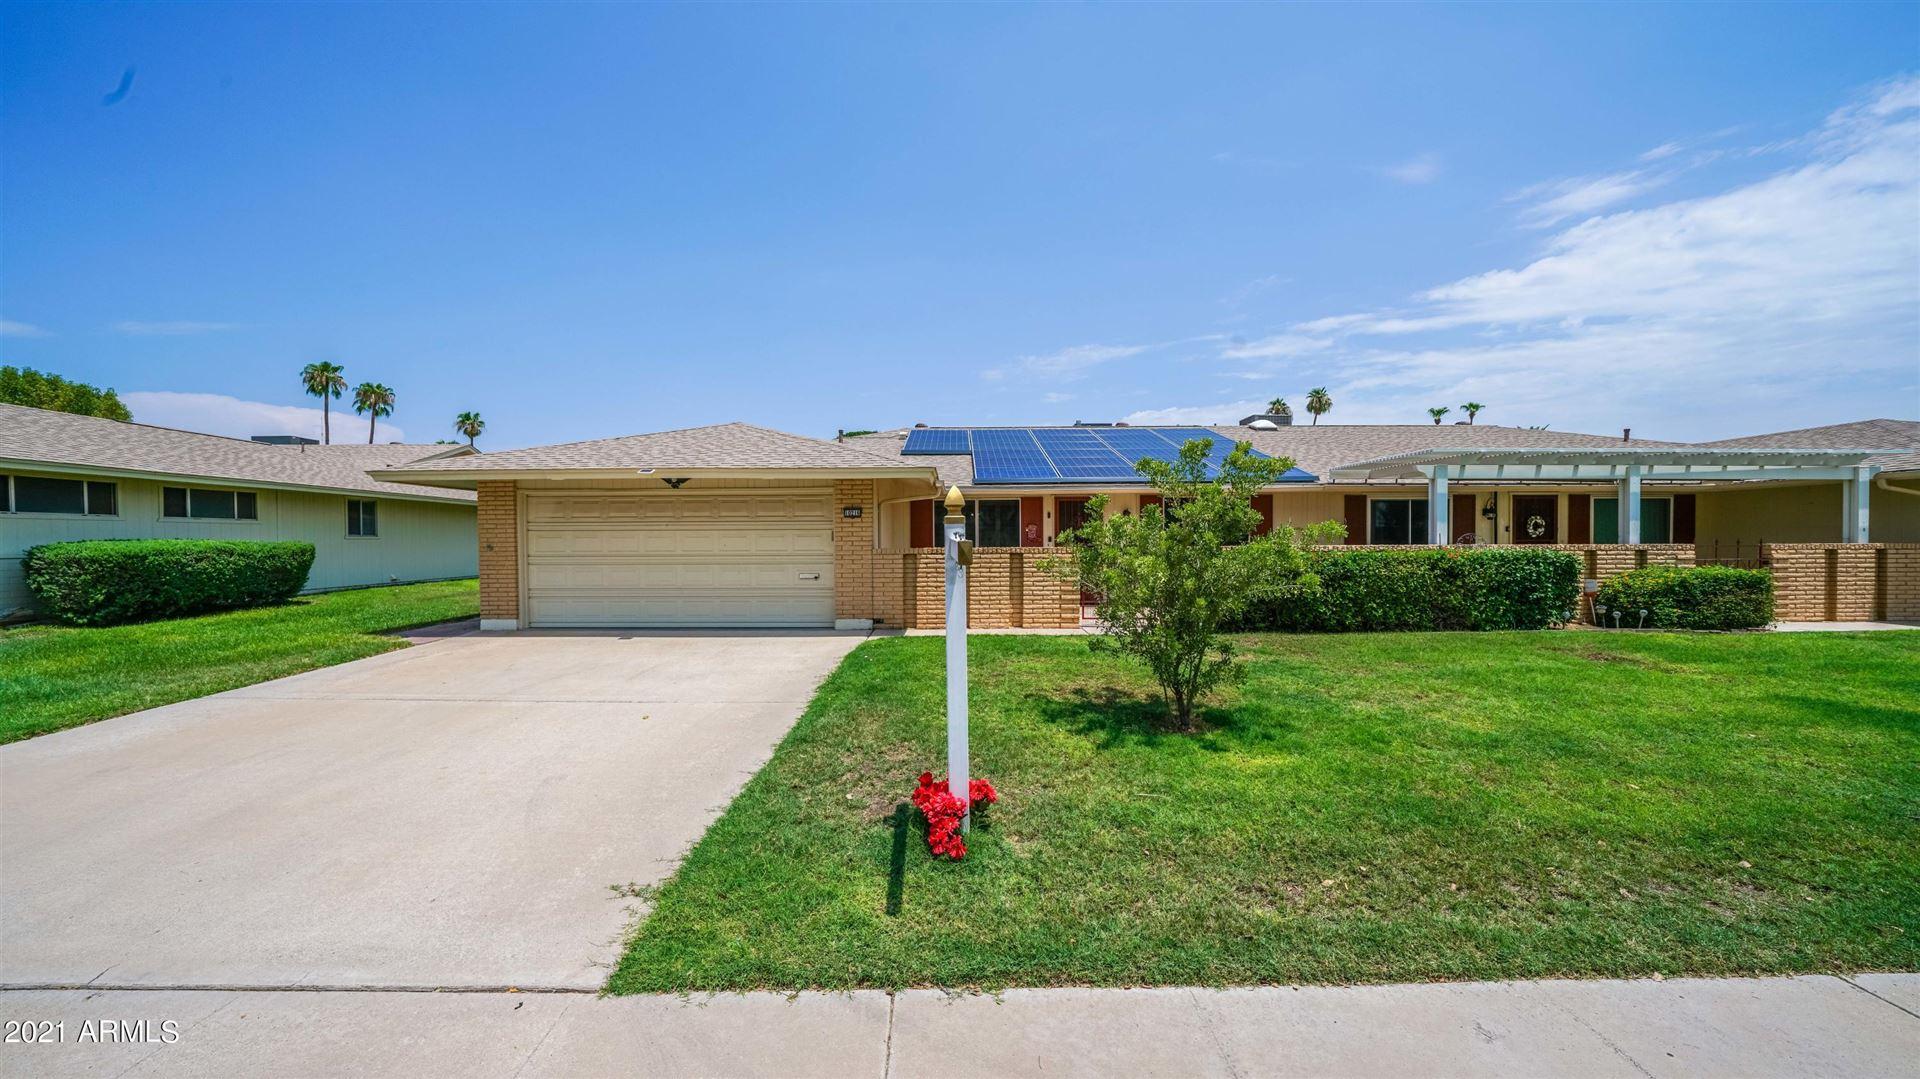 Photo of 10216 W KINGSWOOD Circle, Sun City, AZ 85351 (MLS # 6268086)